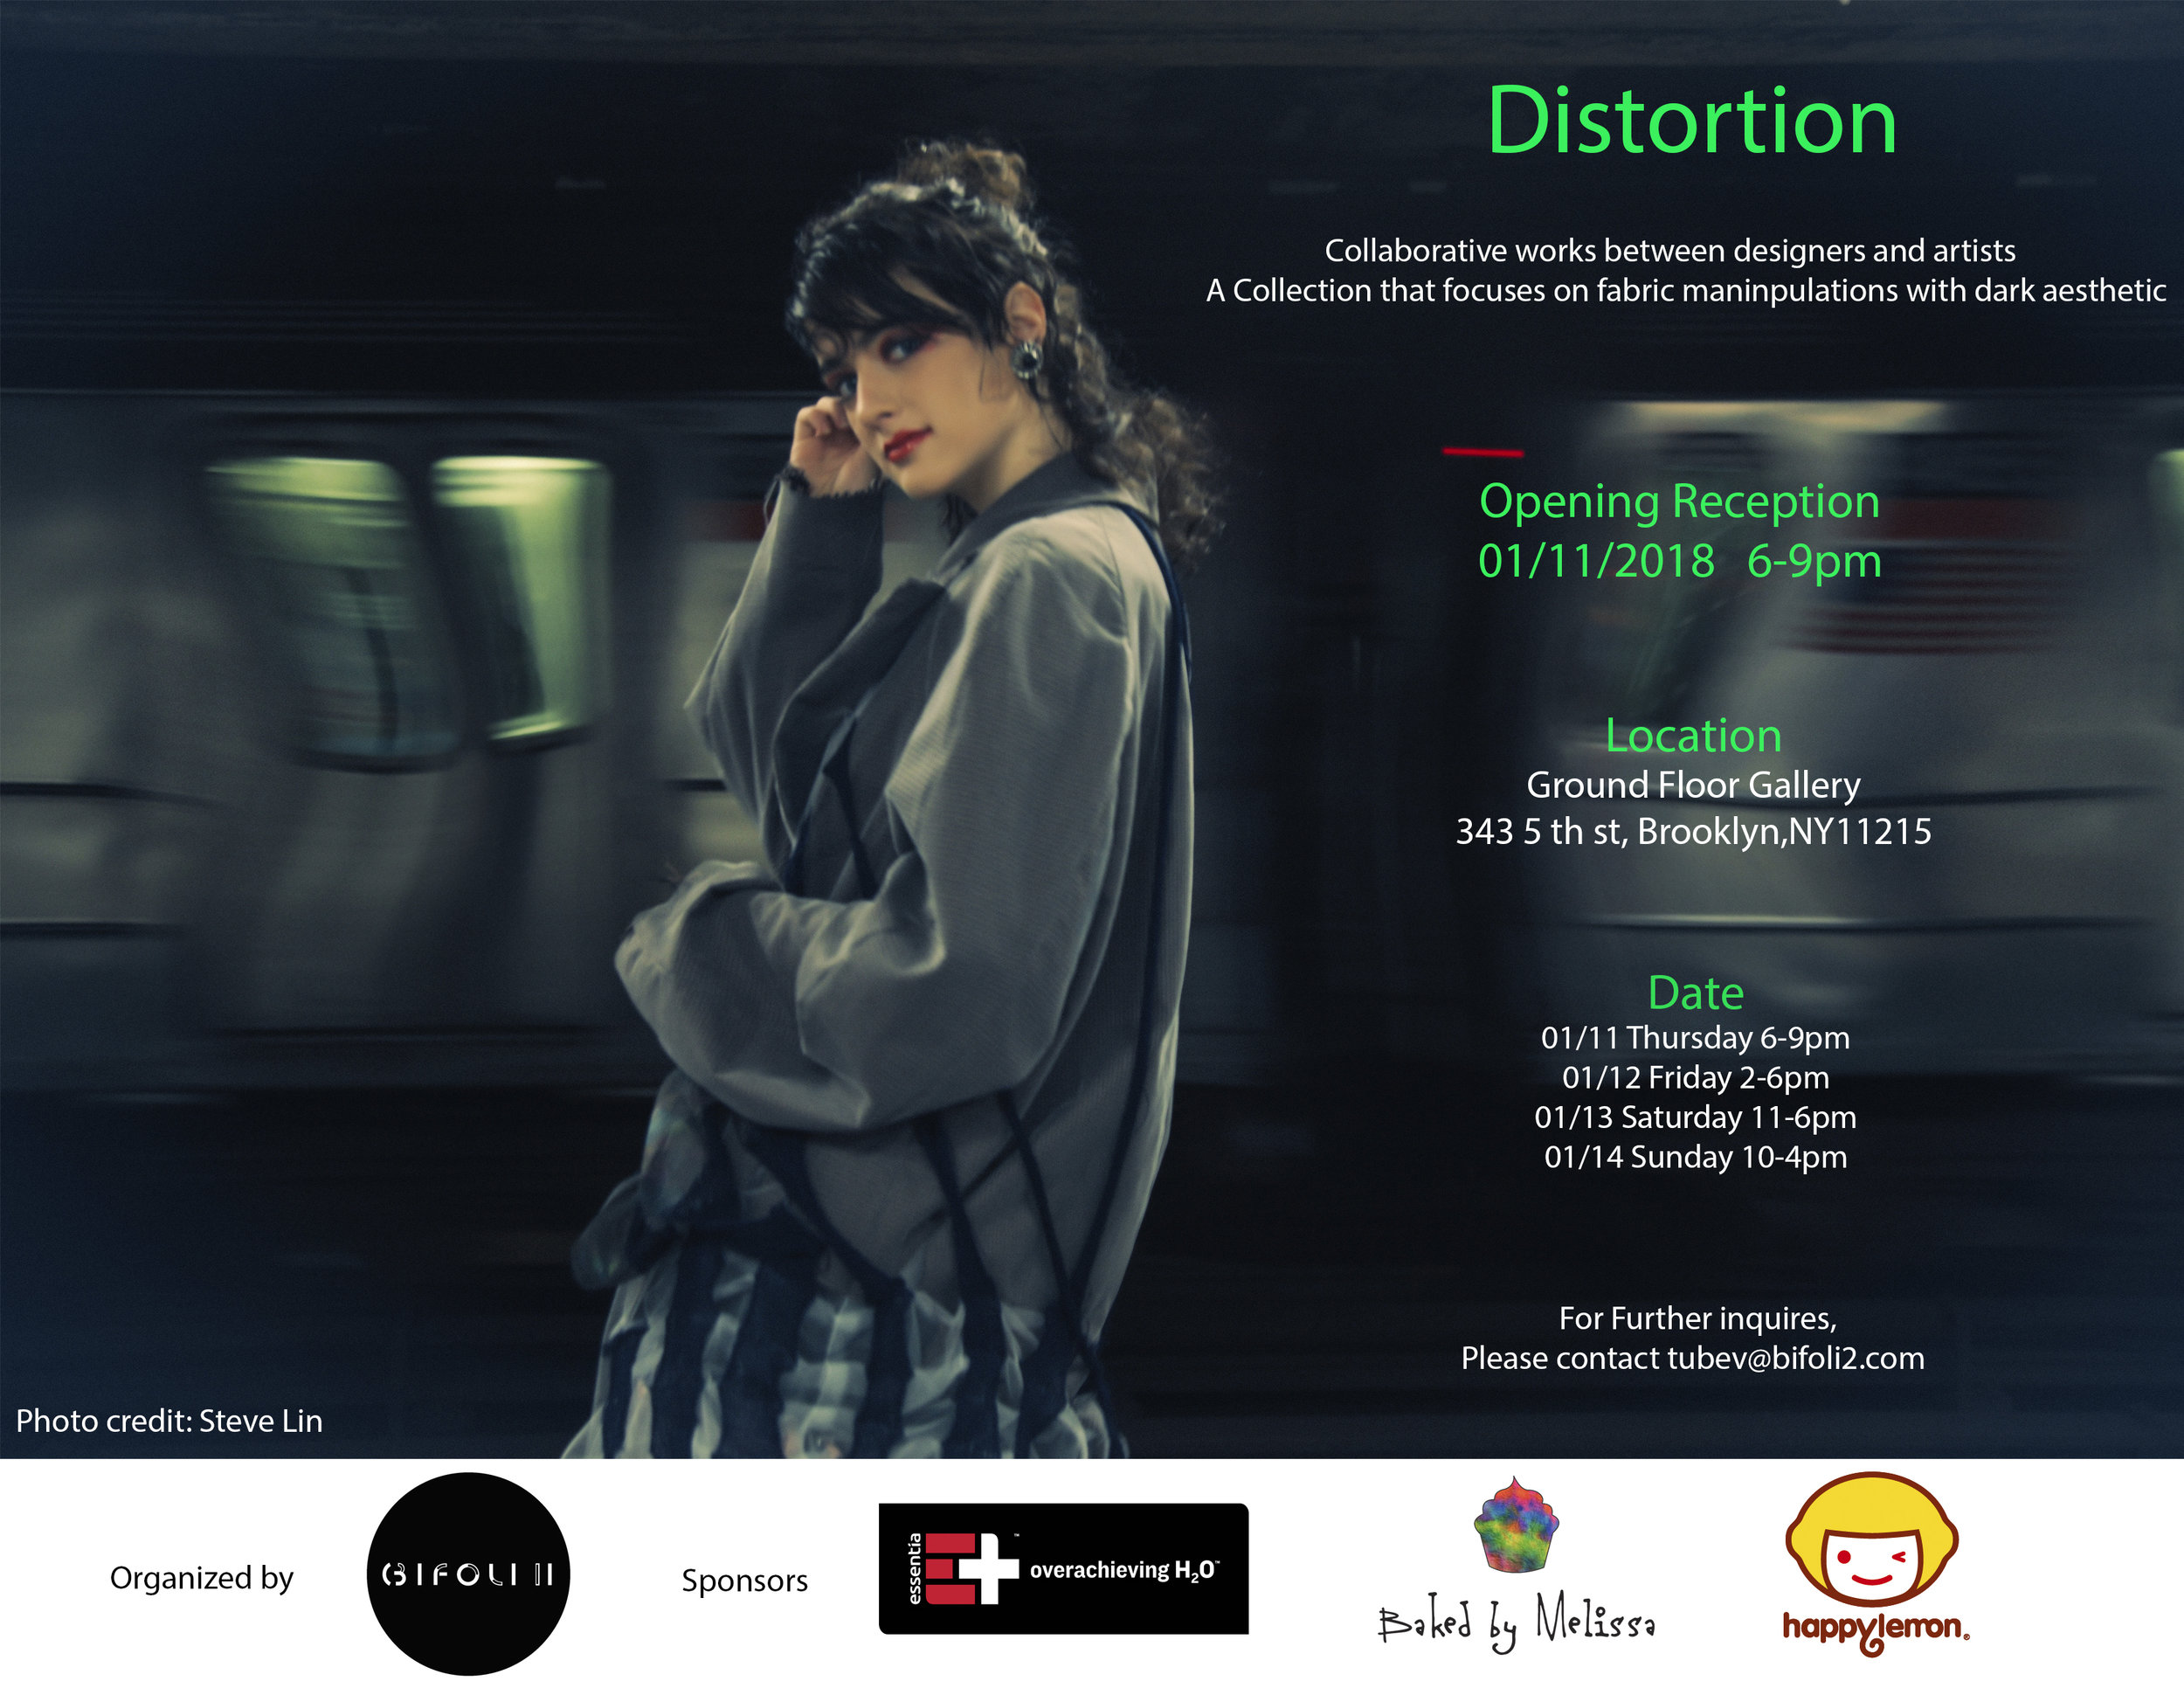 distortion poster.jpg